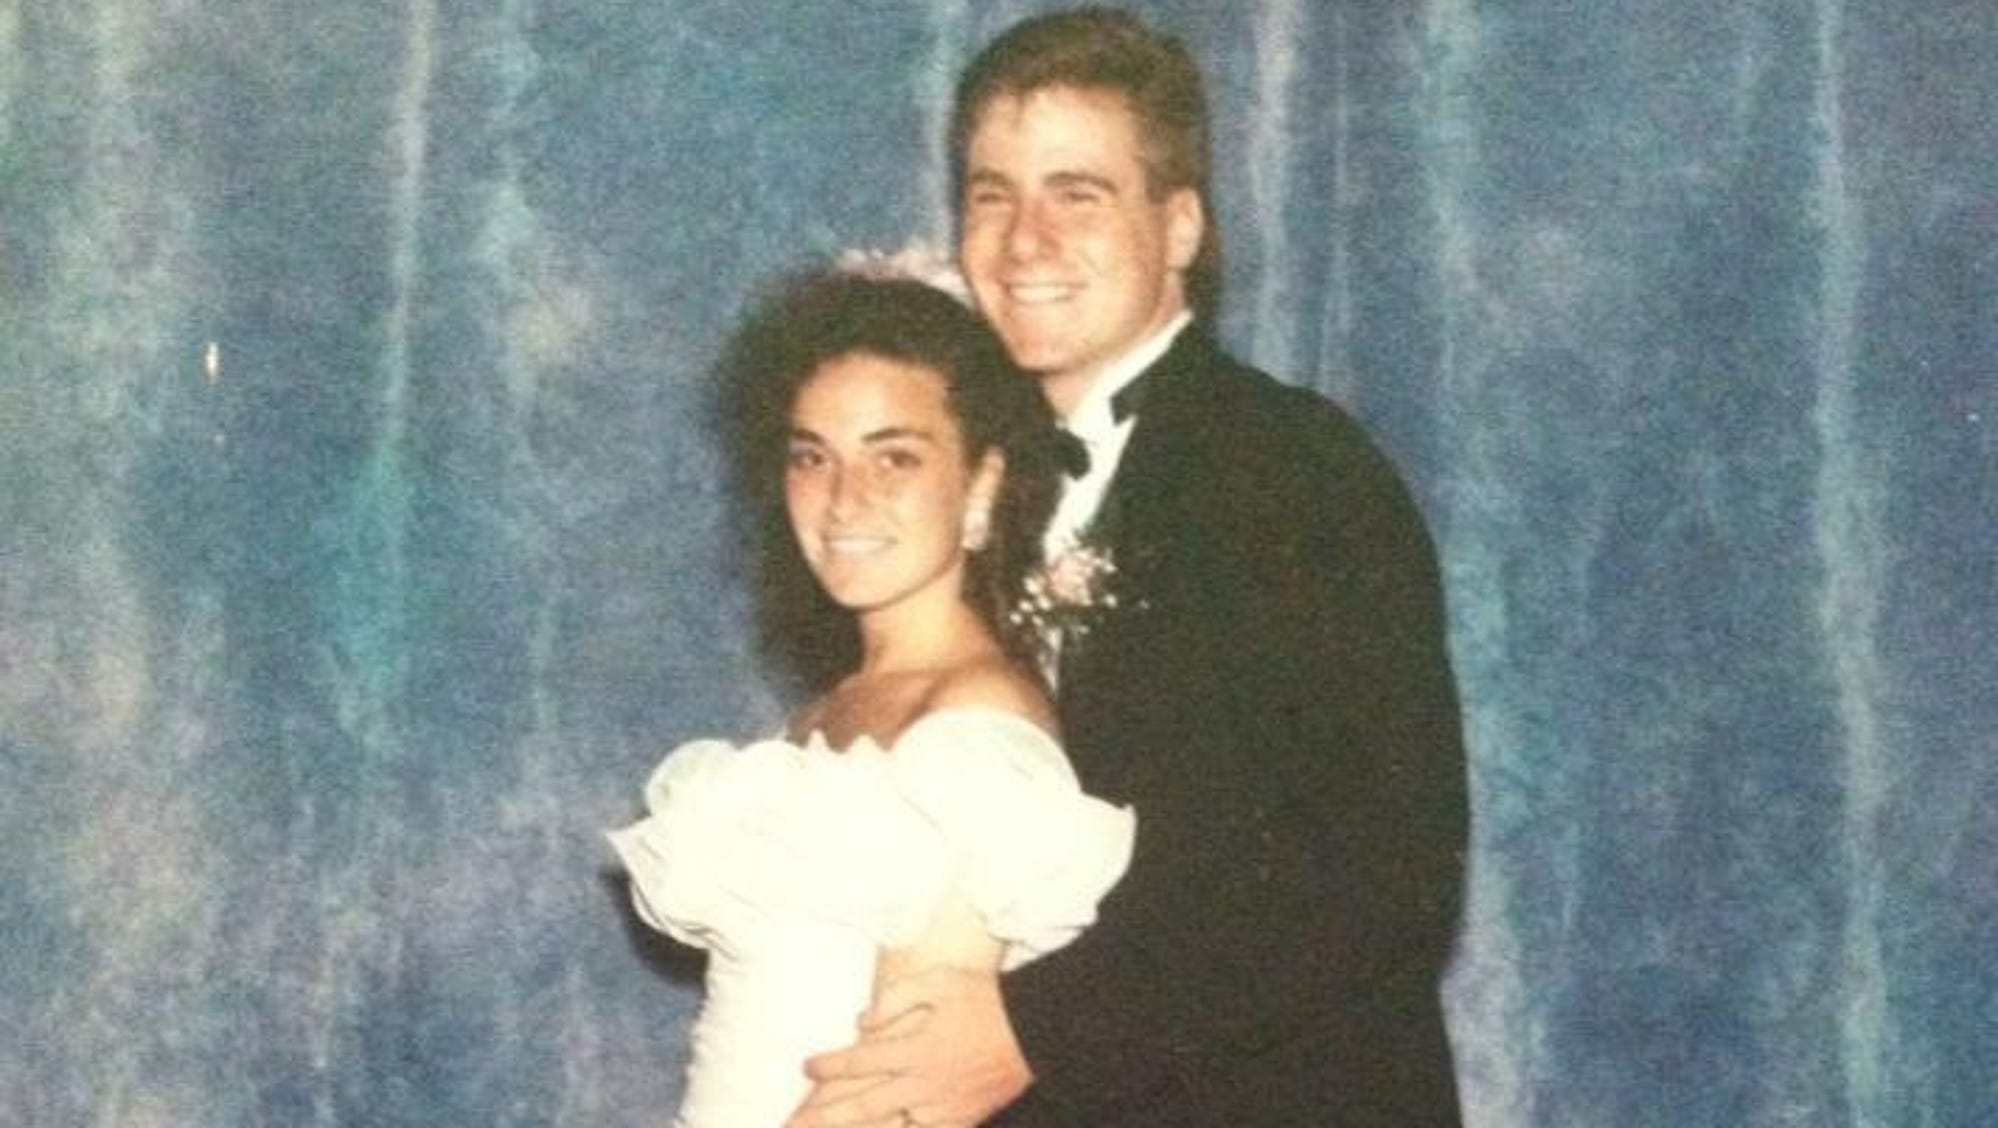 often high school couples meet